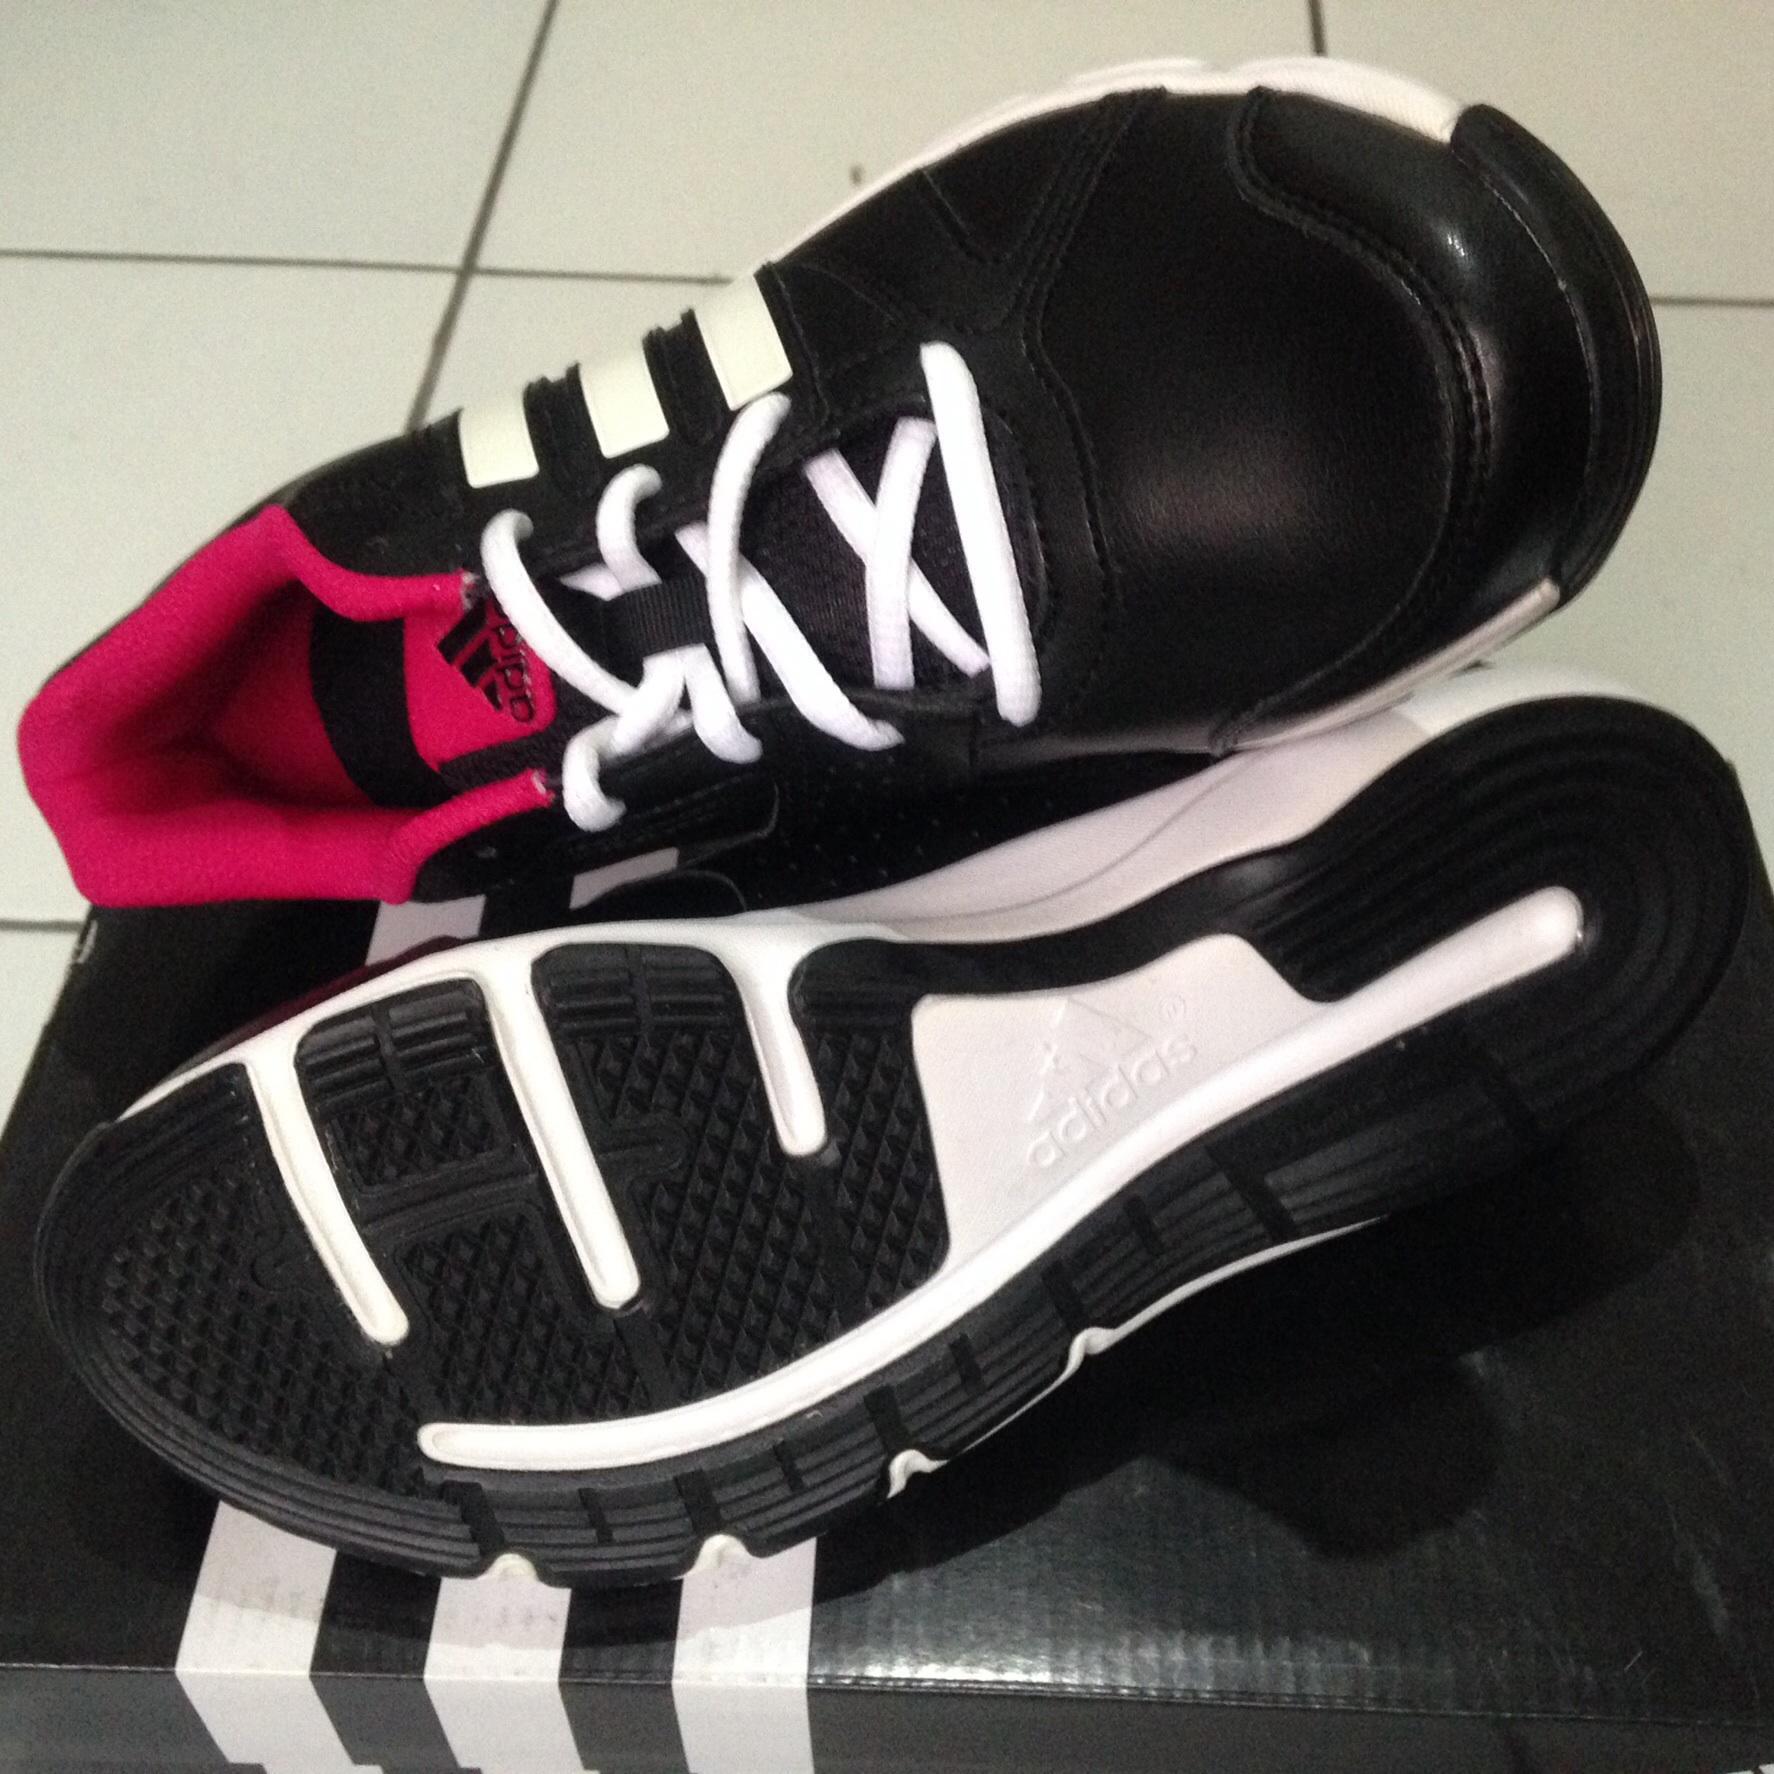 Jual Adidas Essential Star II Women Size 38 Sepatu